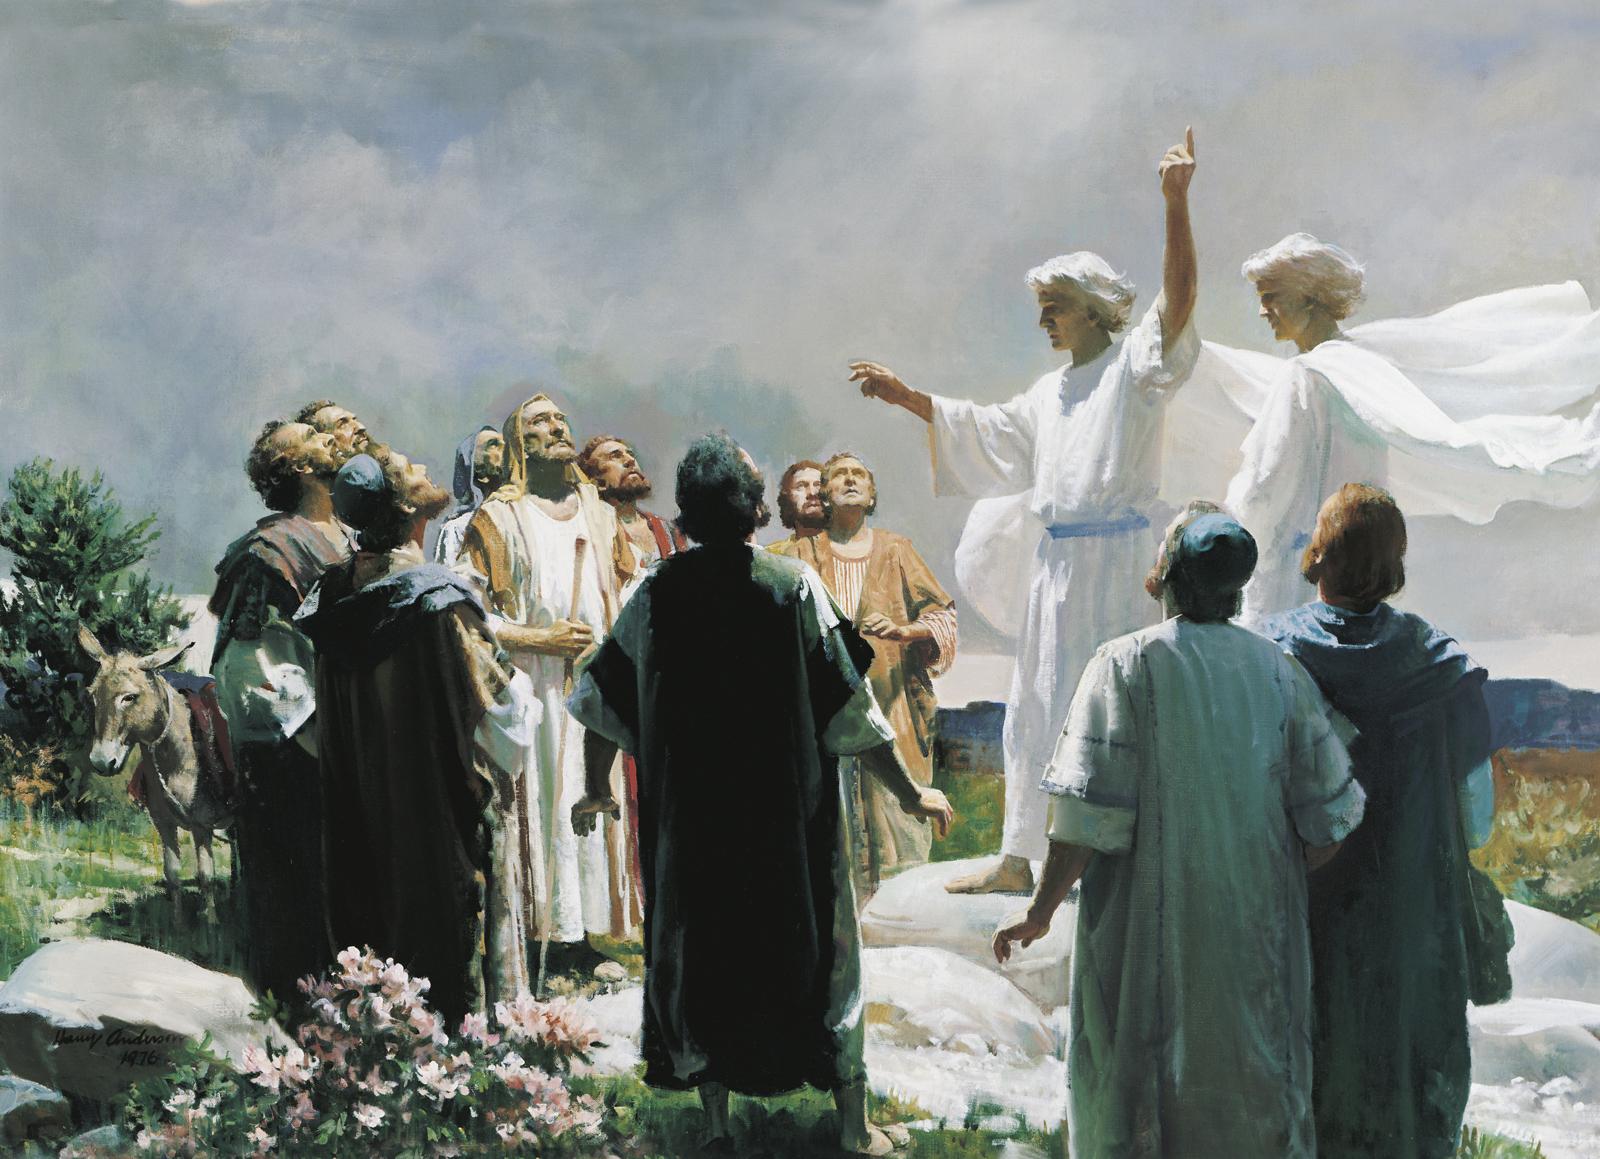 Coloring pages bible story ten virgins -  Ten Virgins Gospel Art Picture The Ascension Of Jesus